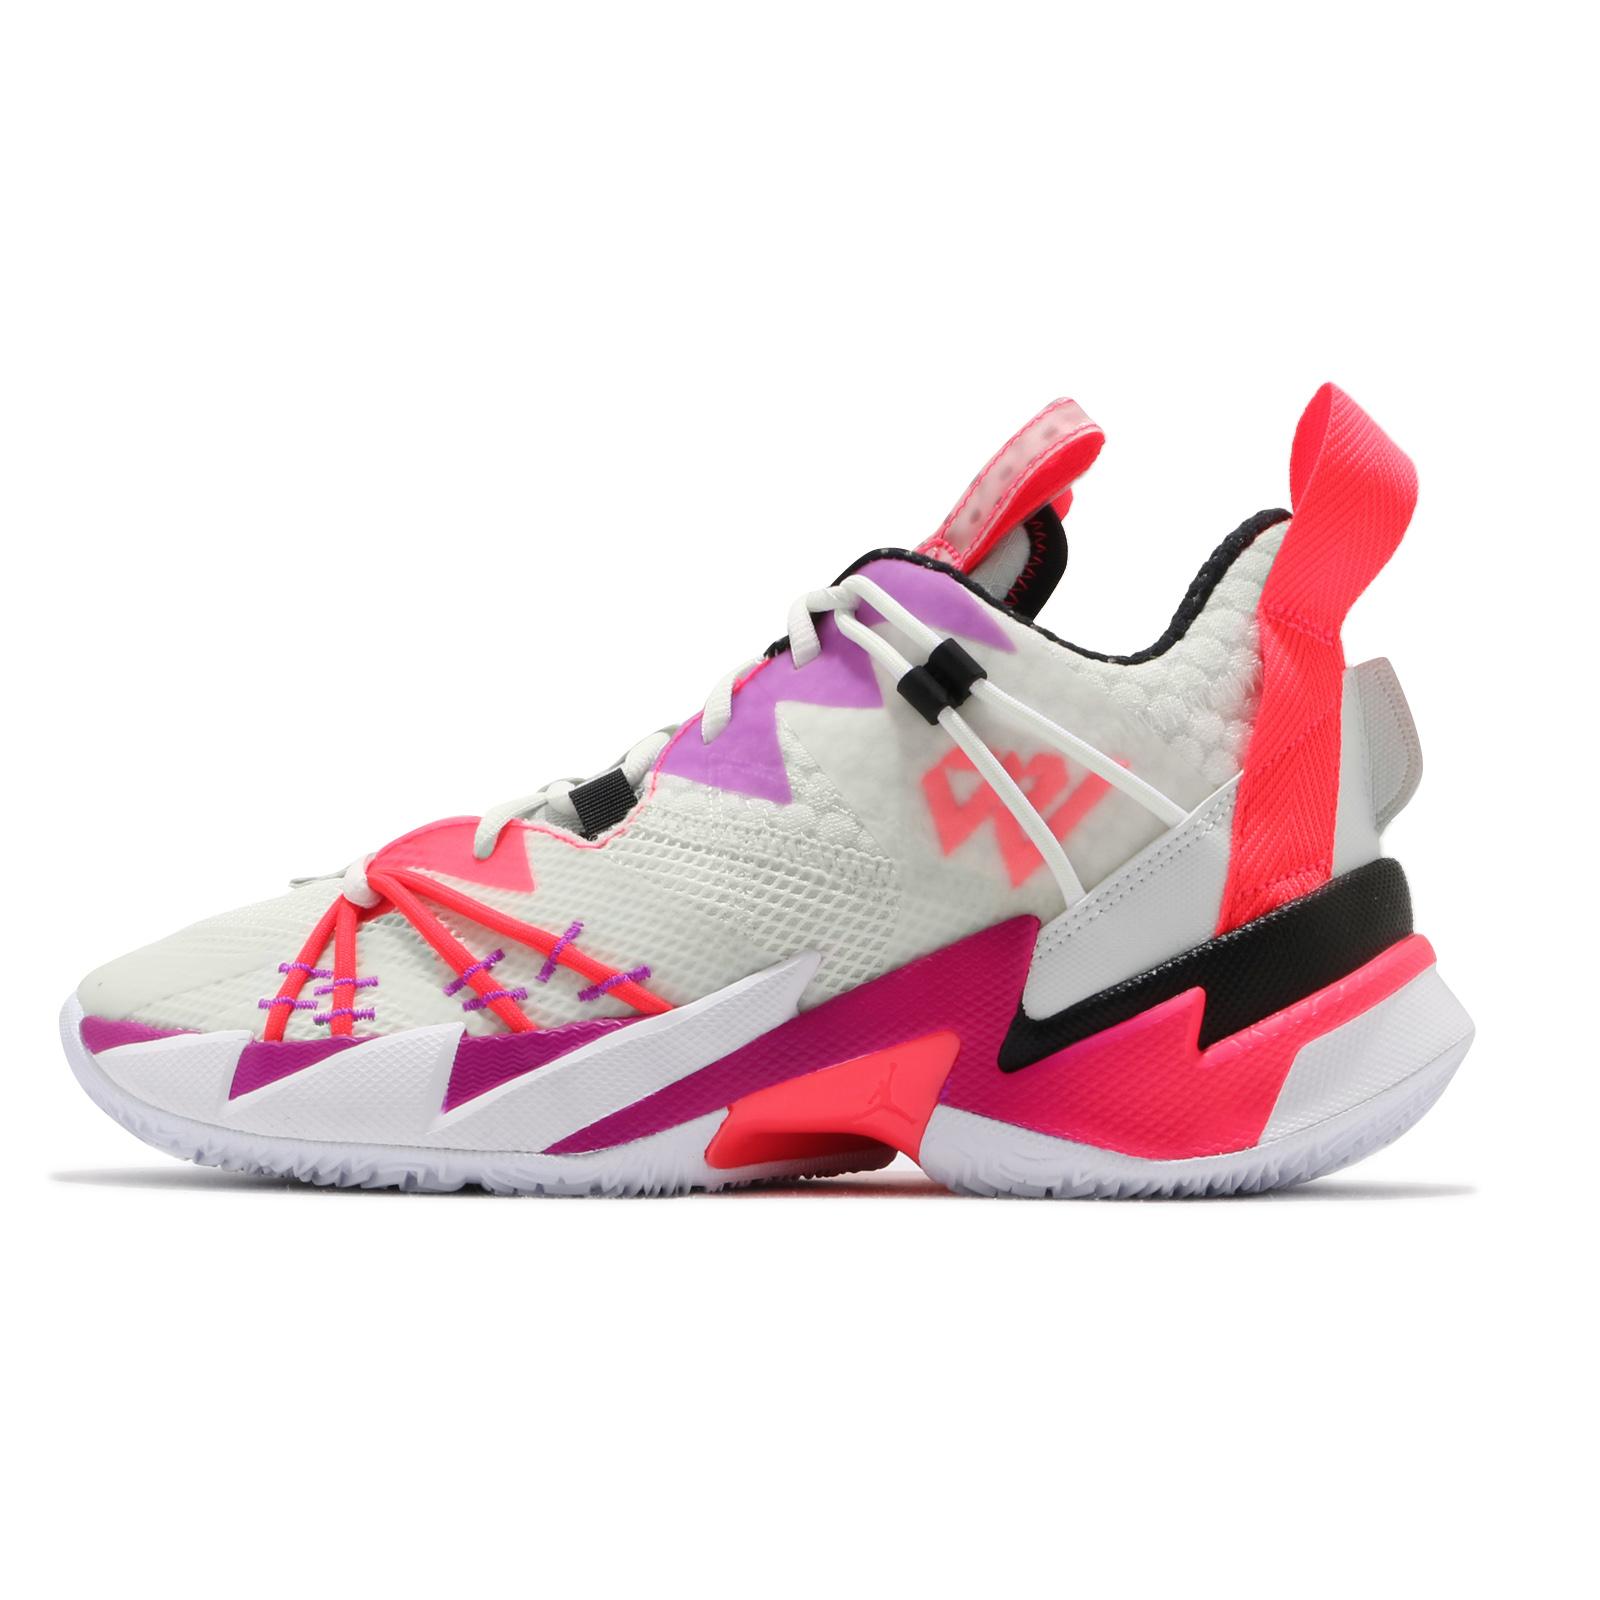 Nike 籃球鞋 Jordan Why Not Zer0.3 SE 白 紫 男鞋 忍者龜【ACS】 CK6612-101